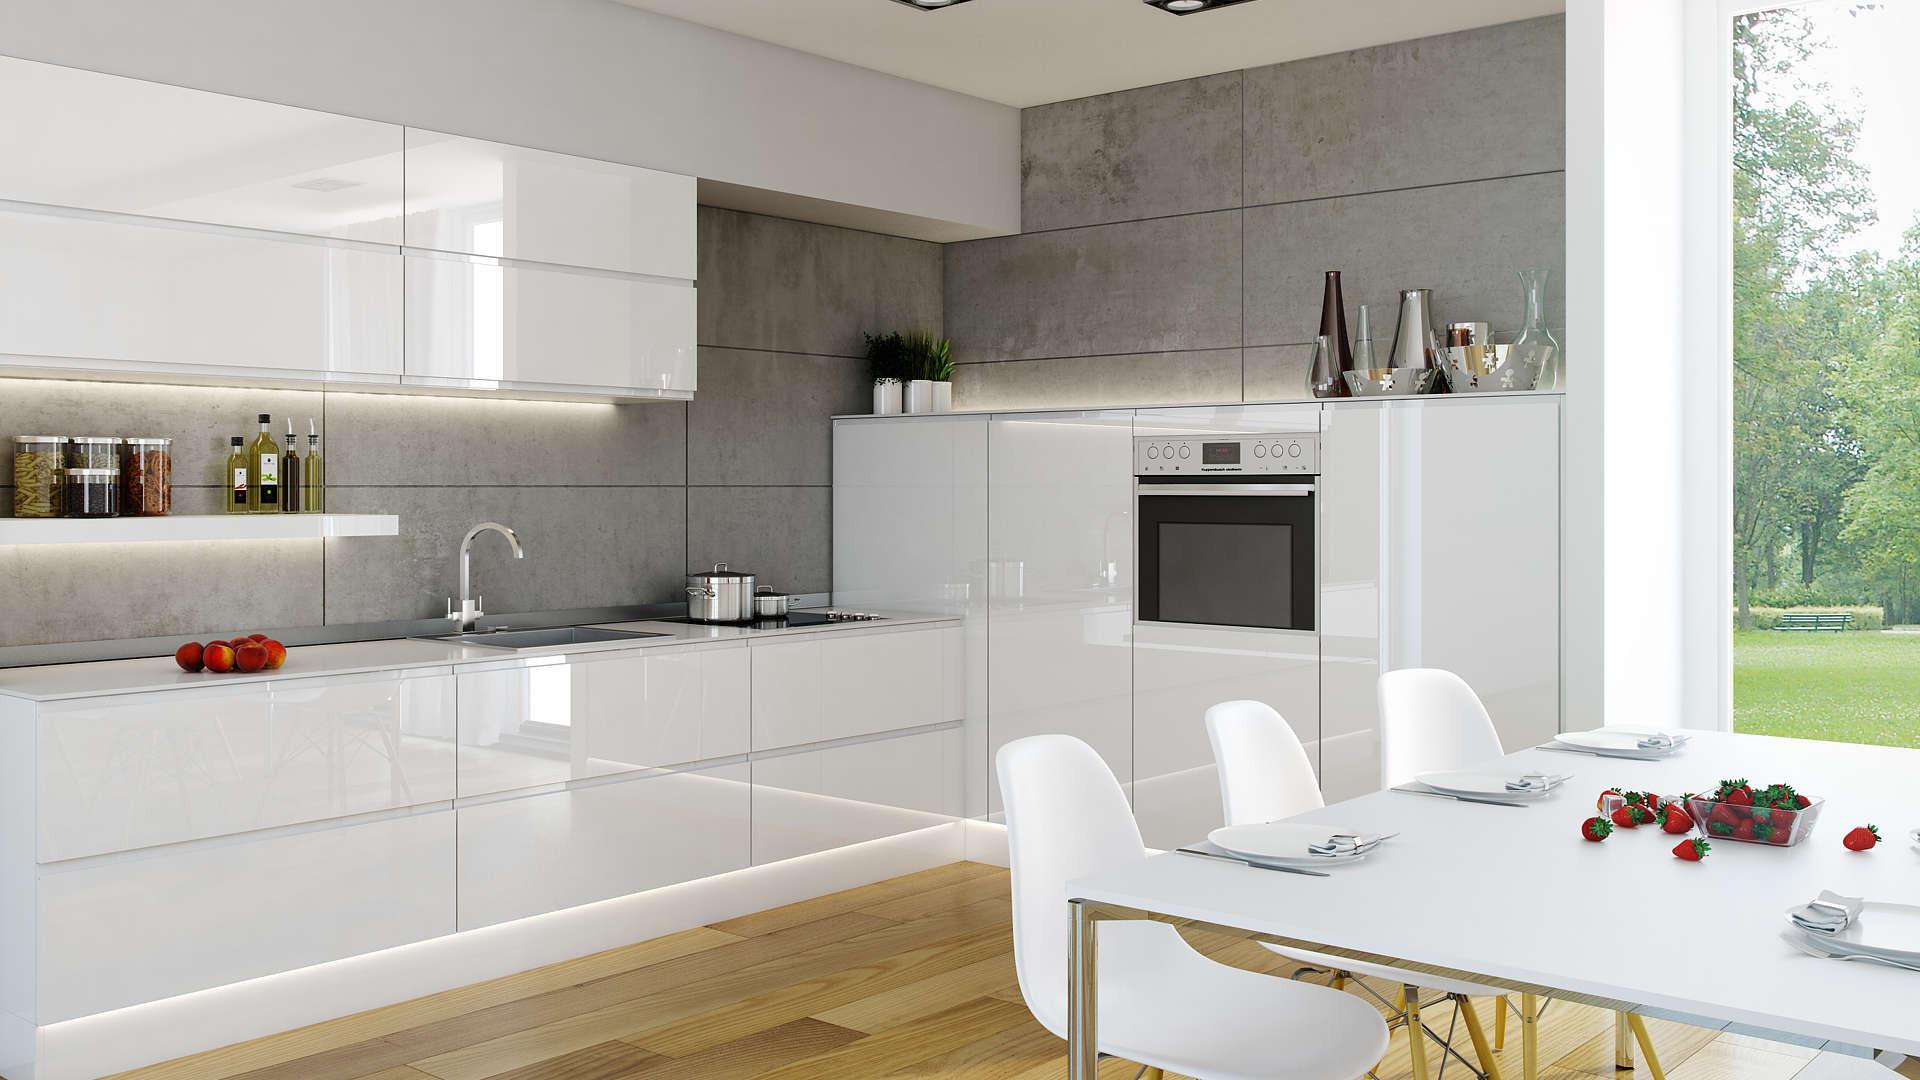 4 Meble Kuchenne Bialystok Kuchnie Wnetrza Bro Studio Pl